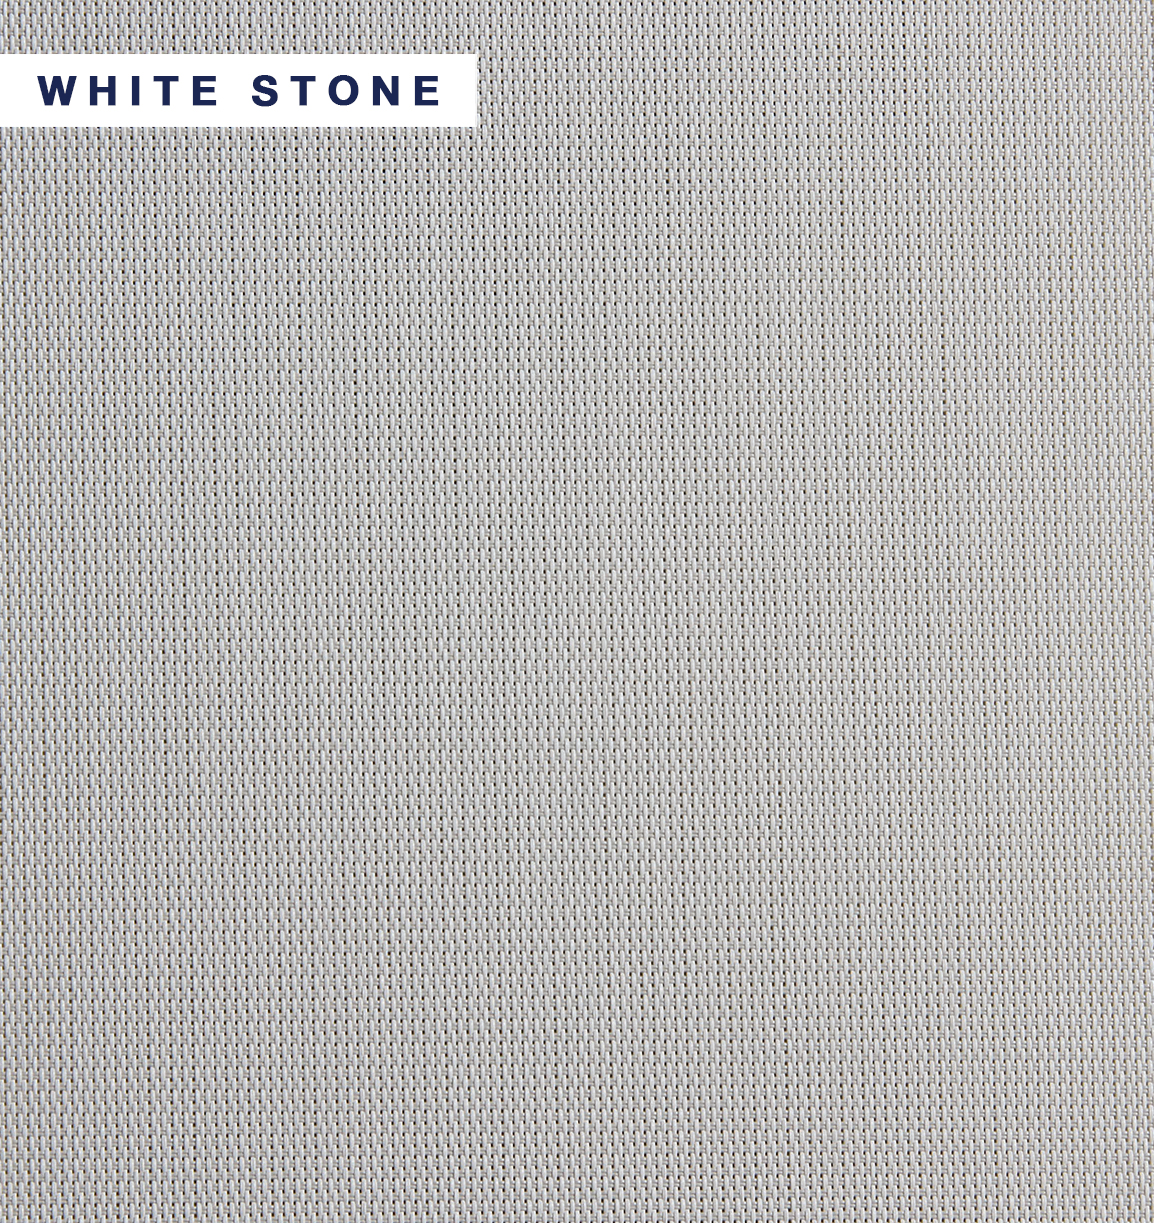 SW4300 - White Stone.jpg